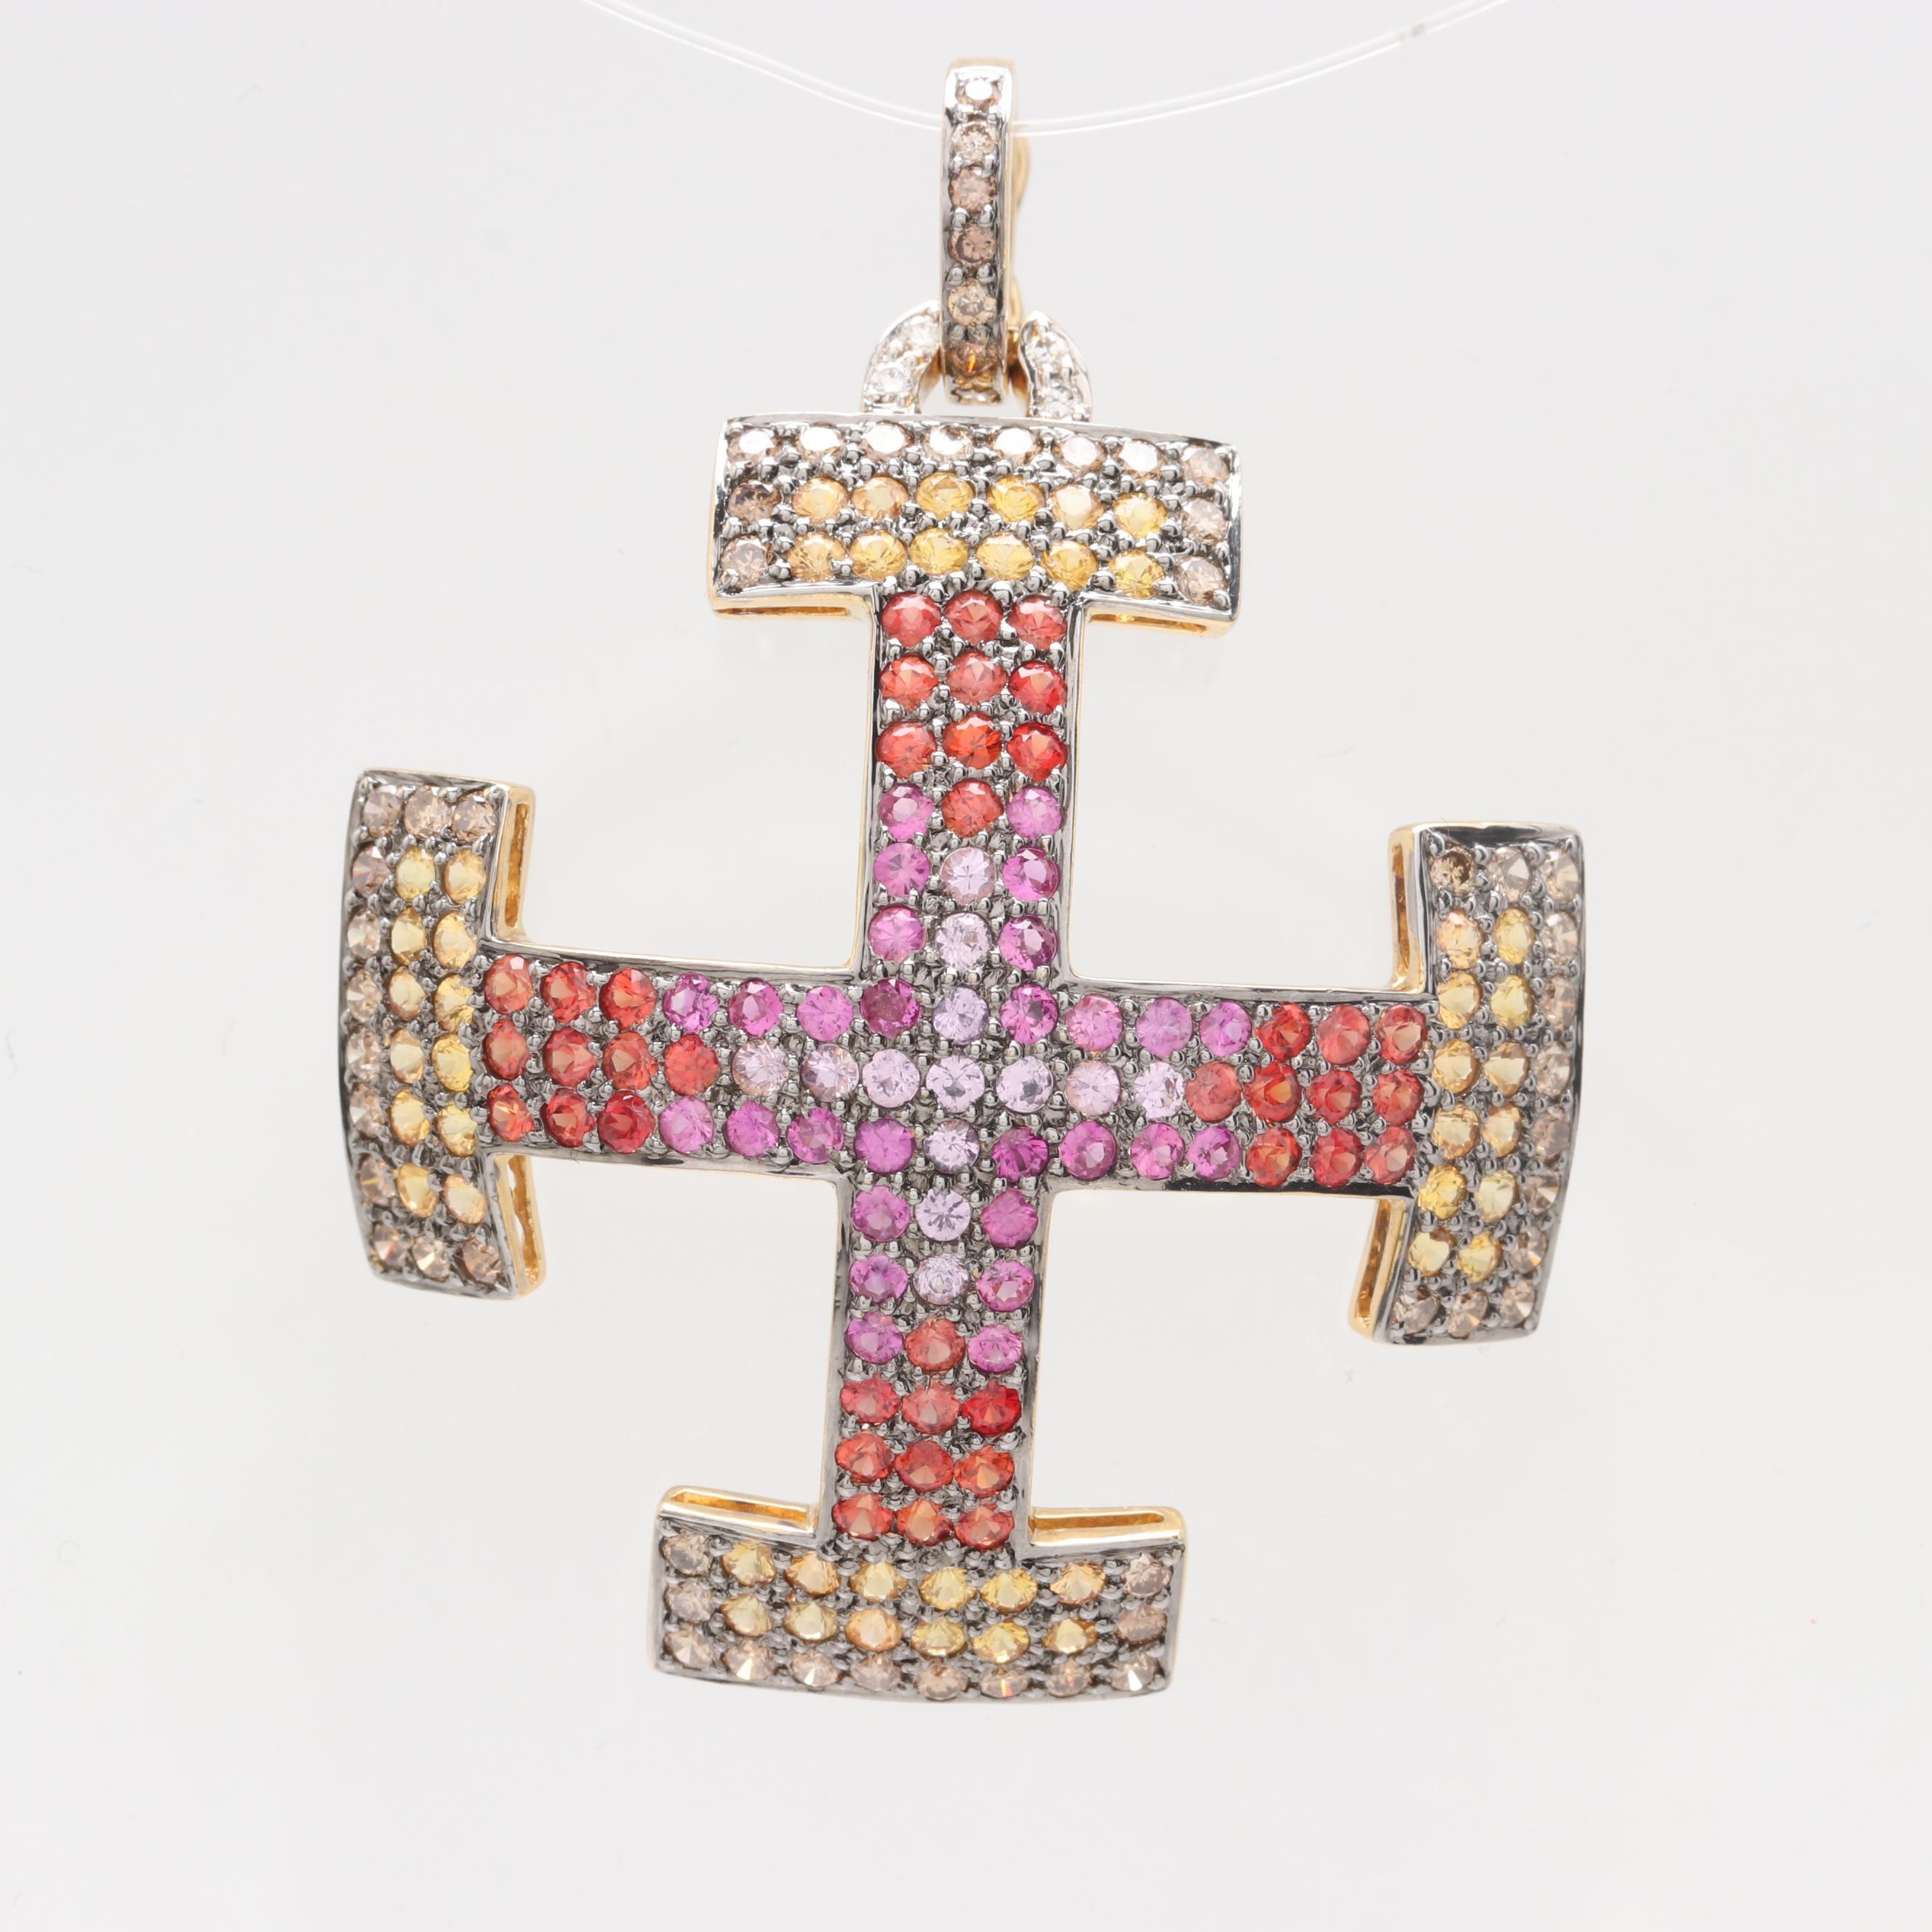 18K Yellow Gold 1.10 CTW Diamond and Fancy Sapphire Cross Potent Pendant